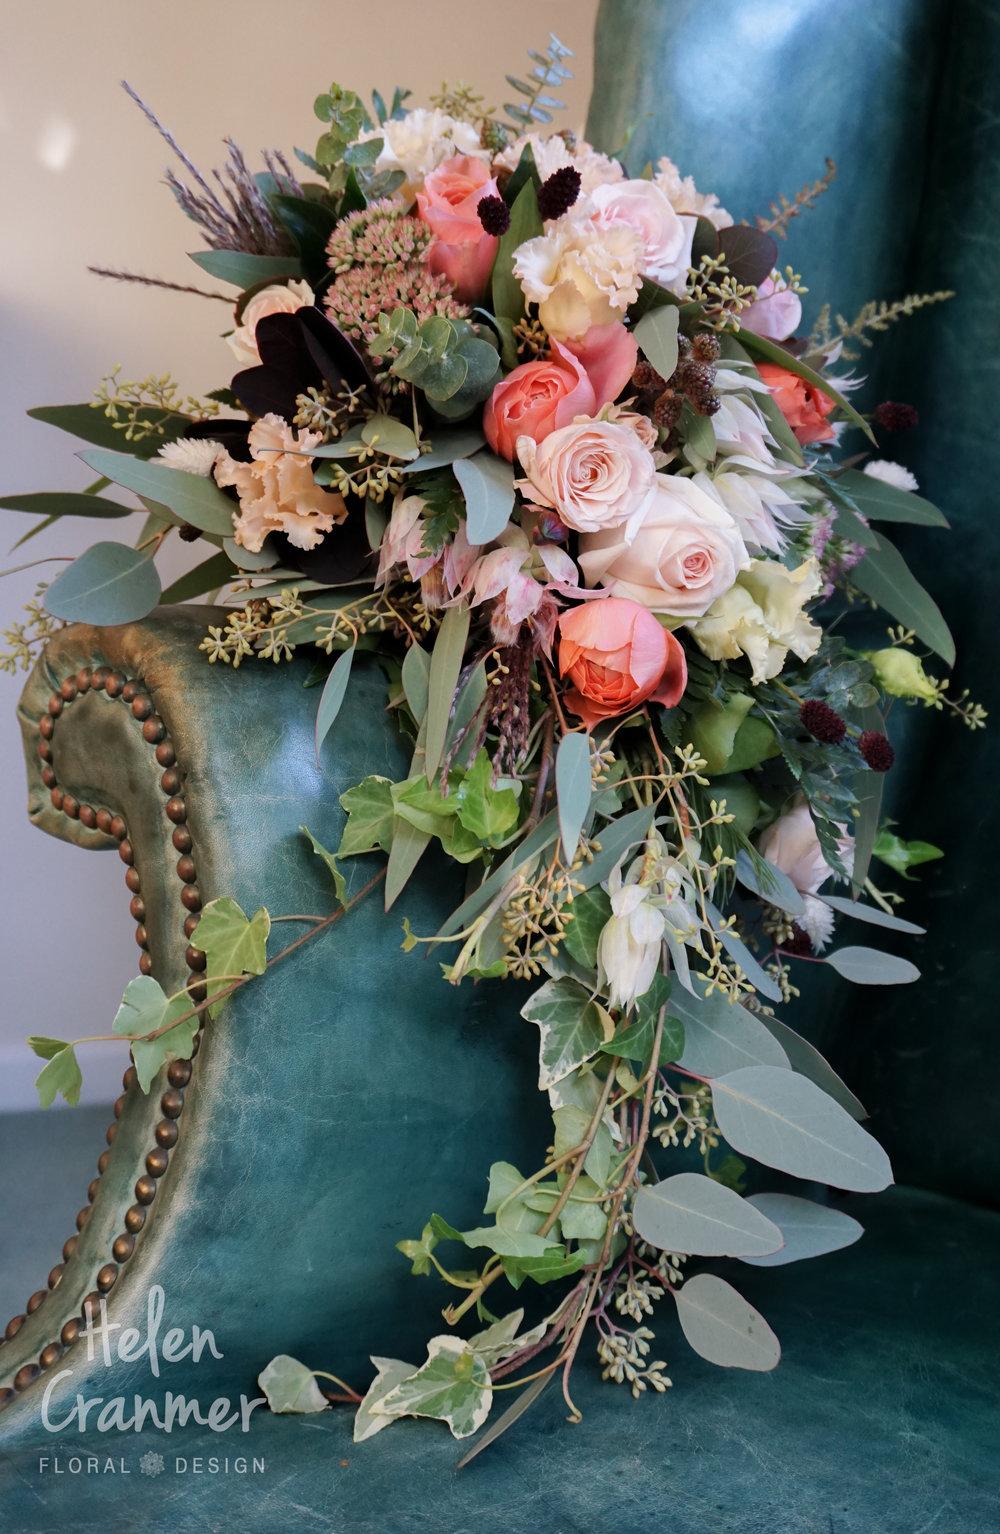 hcfd wedding (11 of 13).jpg